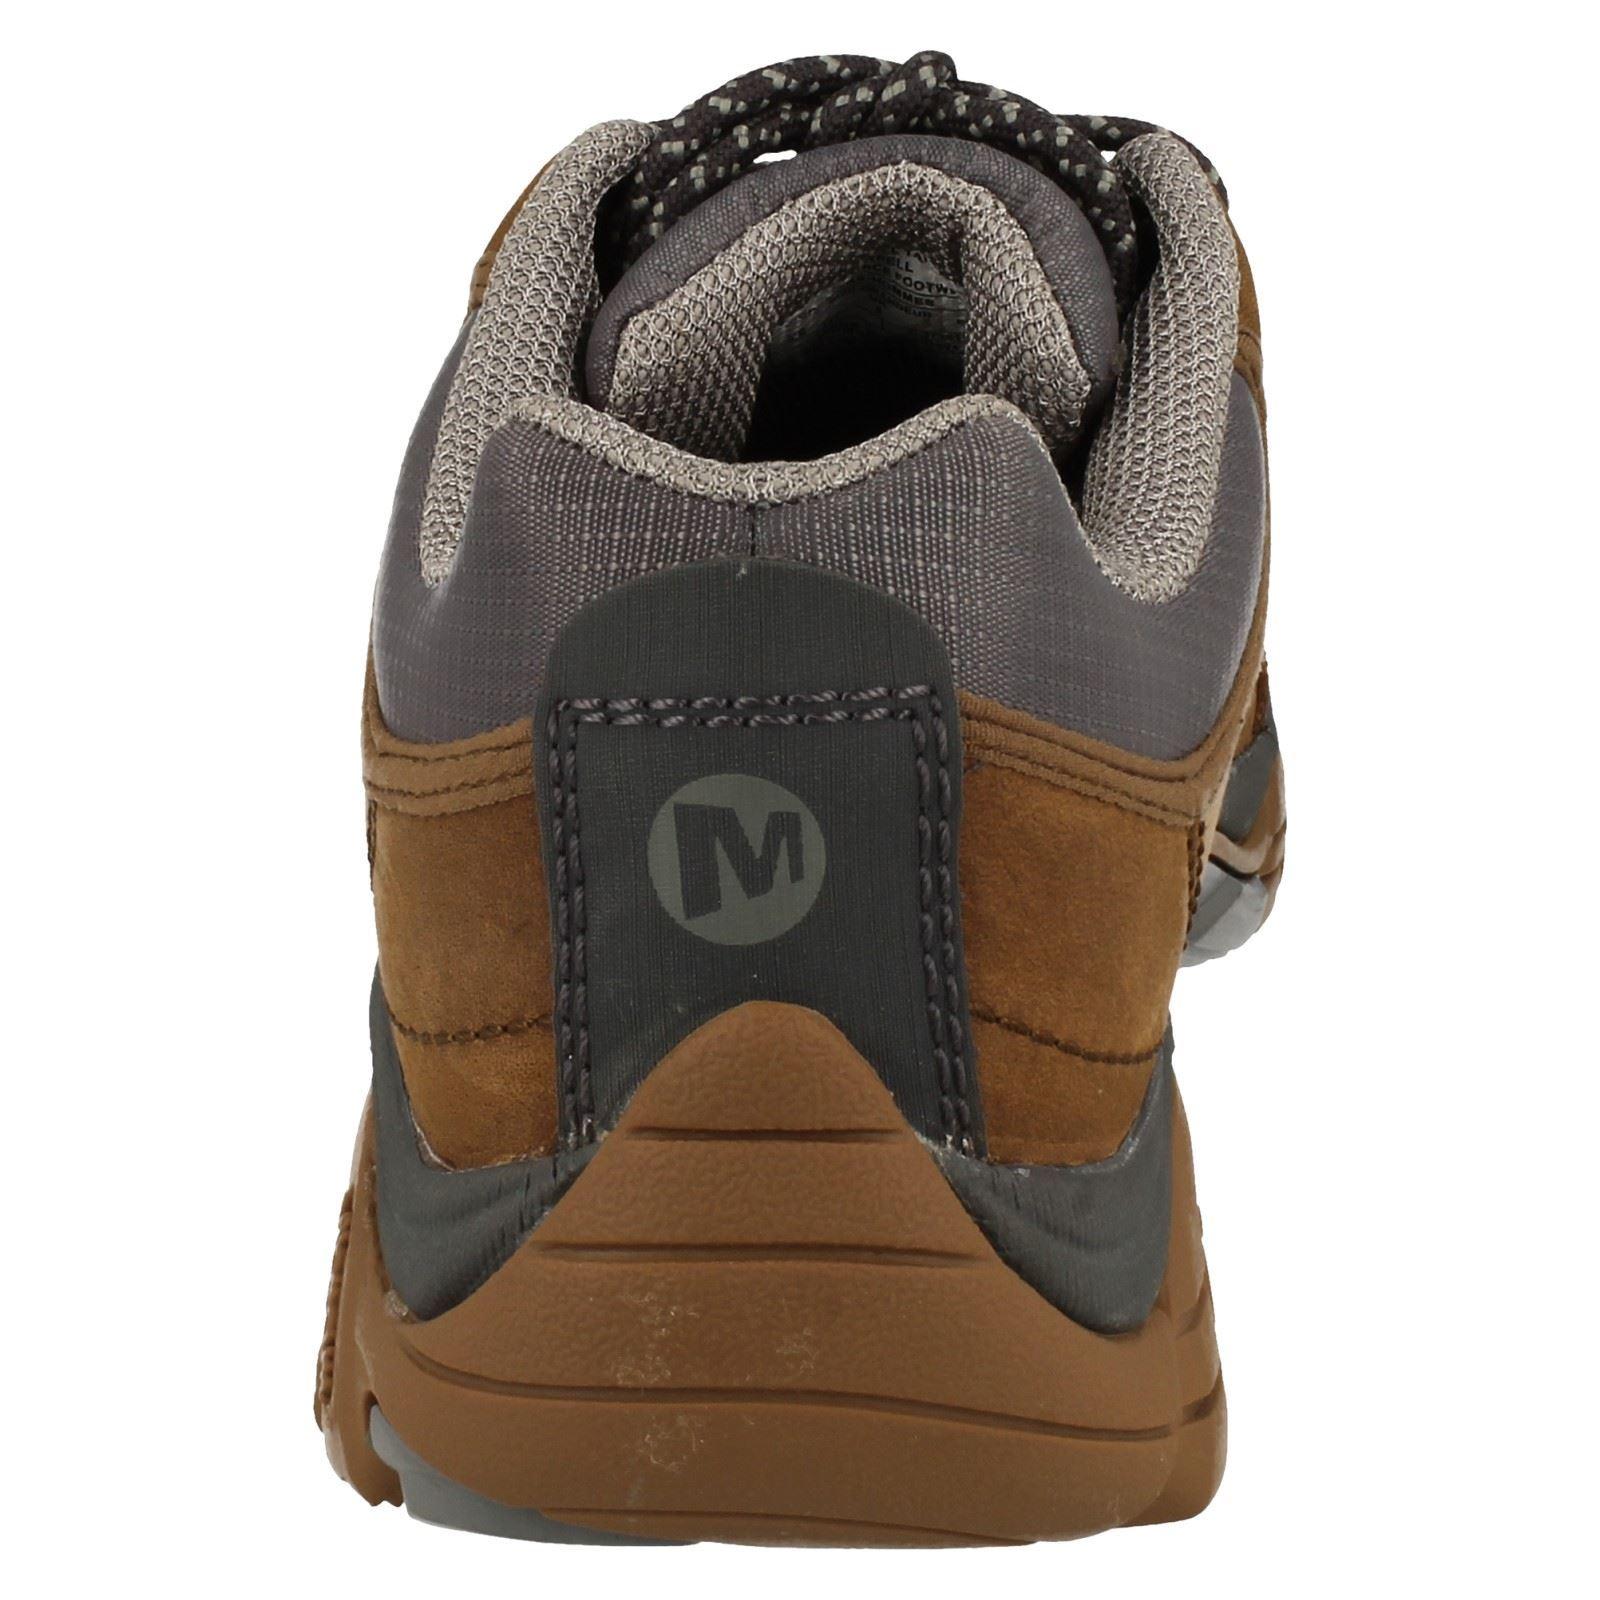 Schuhes Herren Merrell Schuhes  Moab Rover a05c78